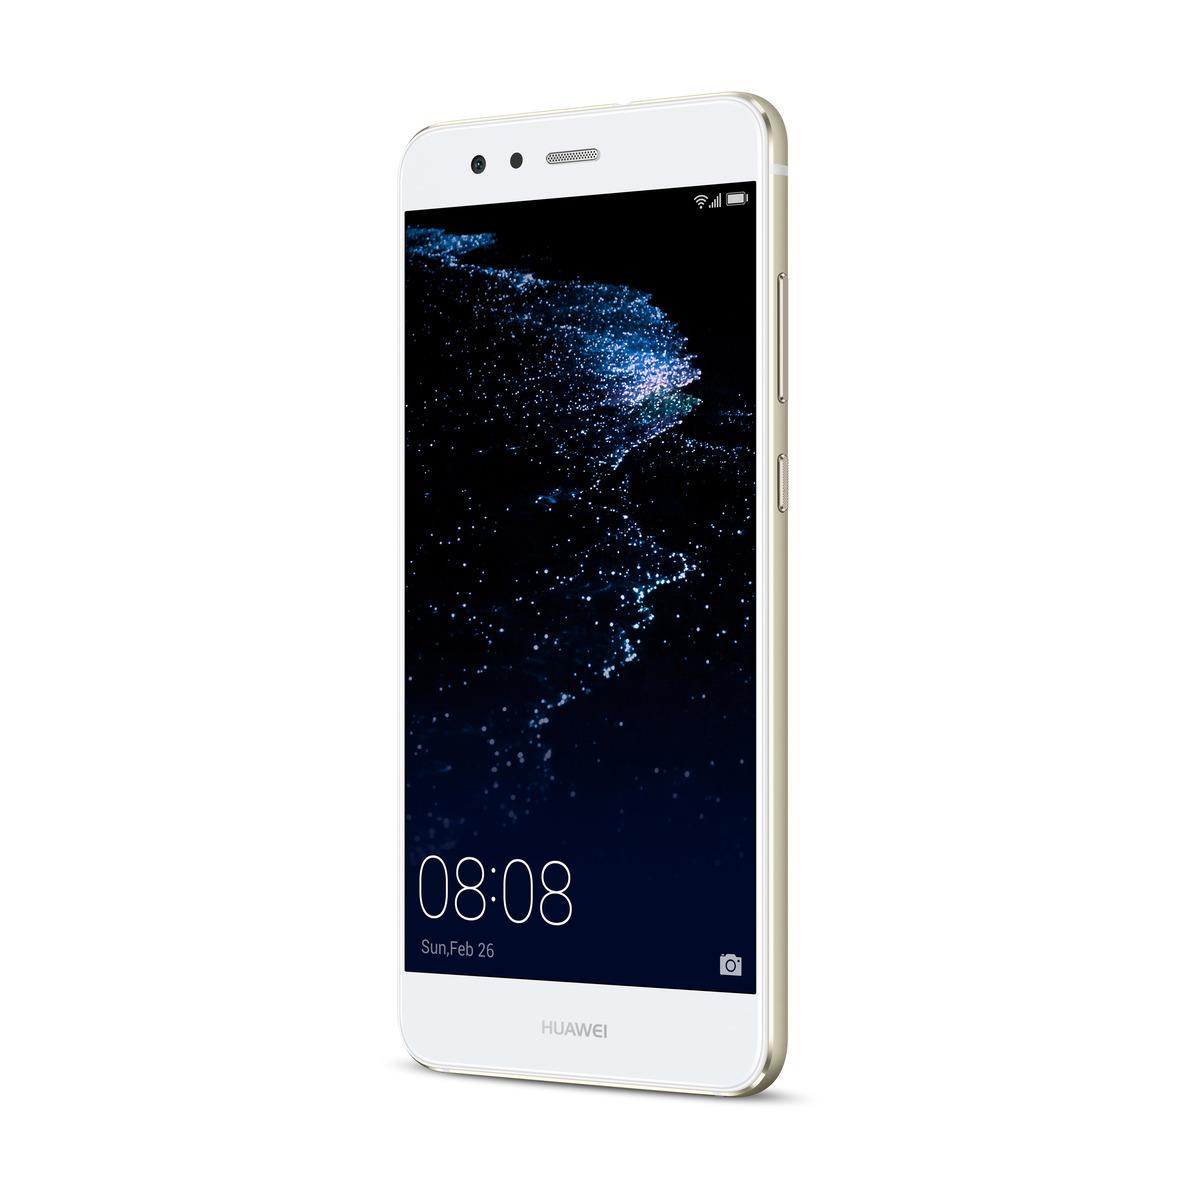 Huawei P10 Lite smarttelefon (hvit)